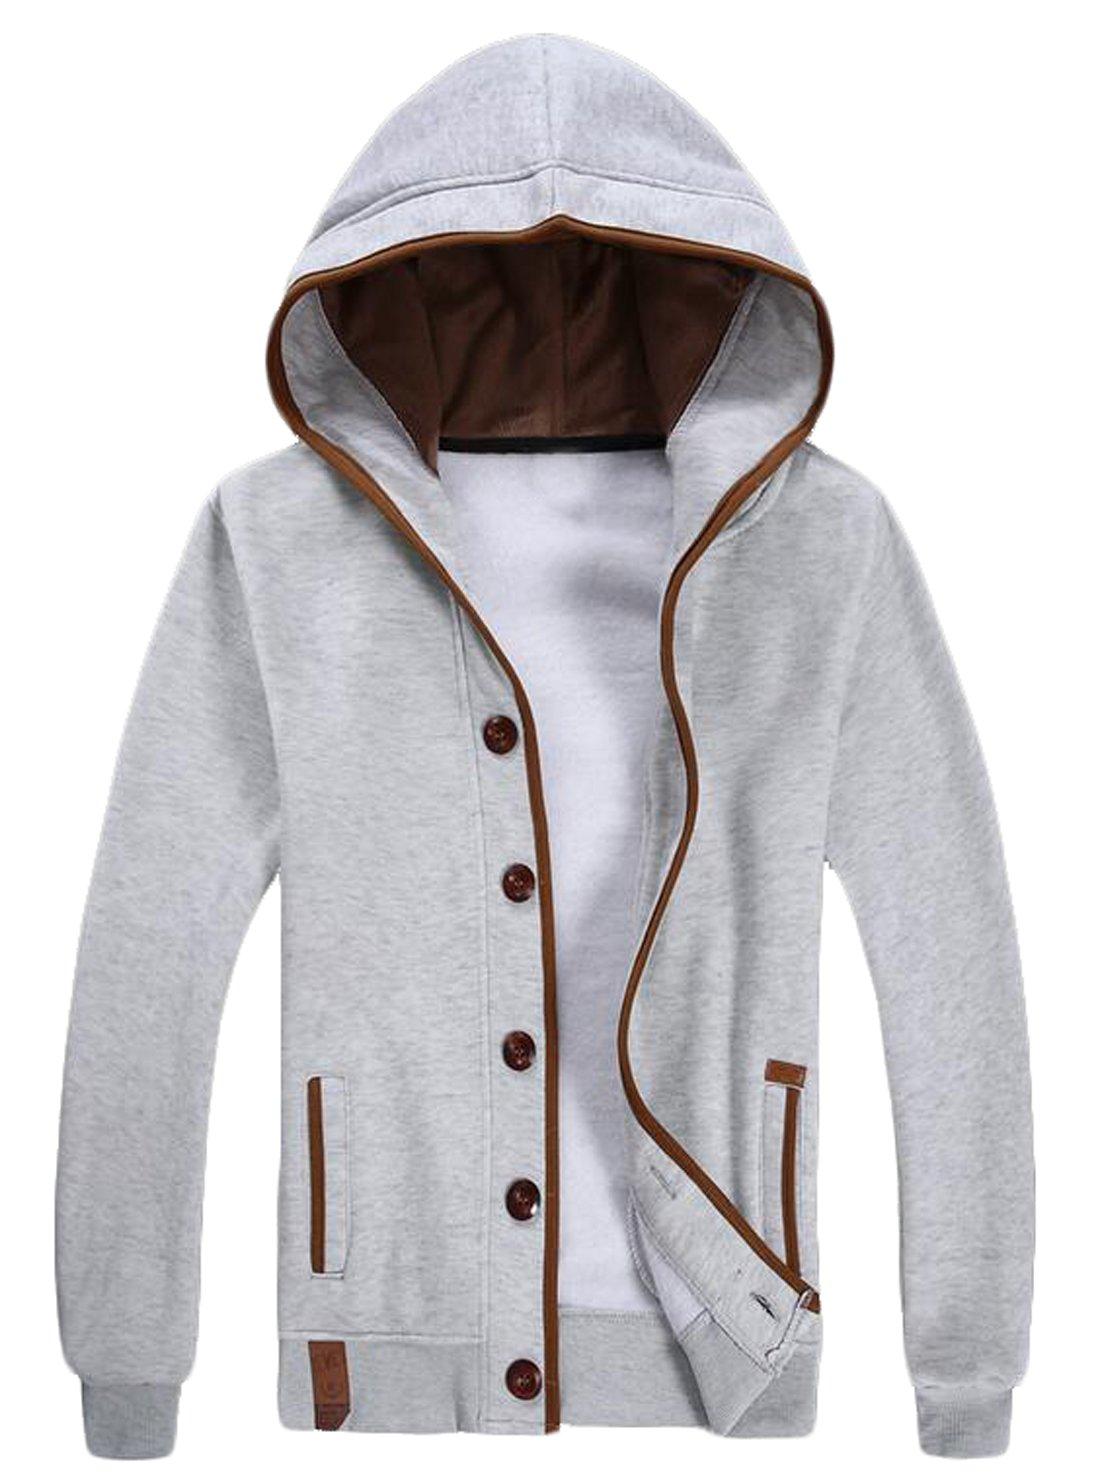 6bc86e18ca Vska Men s Athletic Button Front Hooded Sweatshirt Cardigan White US XXS  Apparel